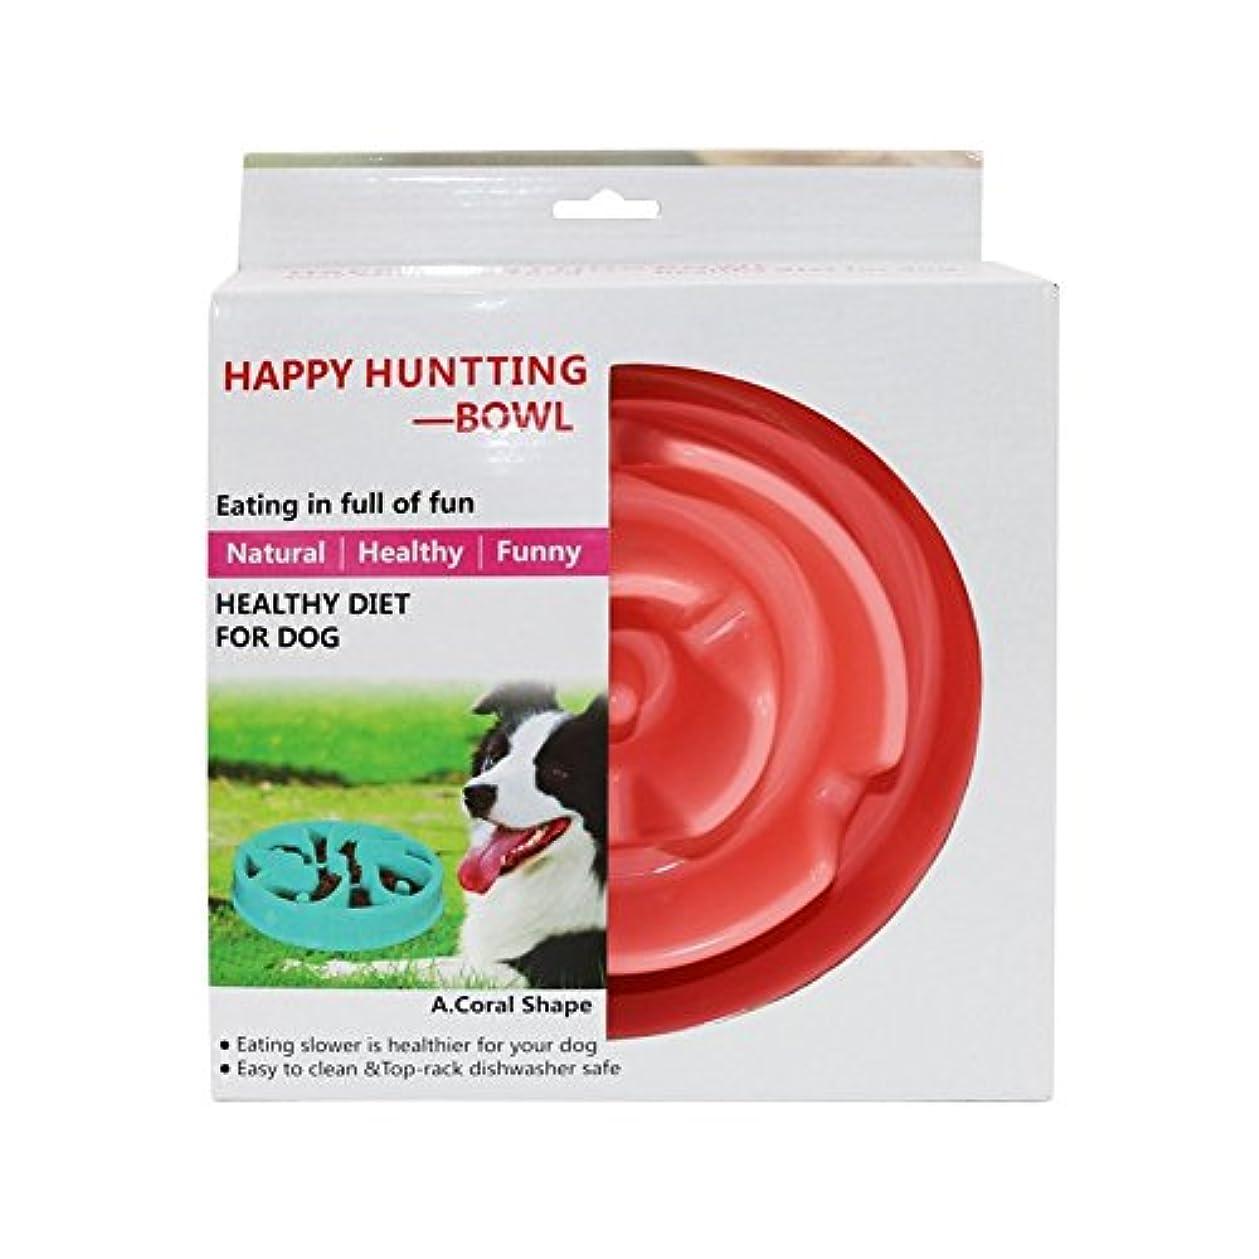 KINGZUO ペット食器 ゆっくり食べるペット食器 早食い防止食器 ペット皿 フードボウル ゆっくりデコボコ食器 ごはん入れ 犬 フィーダー 餌やり&水やり用品 ダイエットドッグ 滑り止め 安全健康 肥大化防止 肥満解消 犬 猫 (ピンク) [並行輸入品]